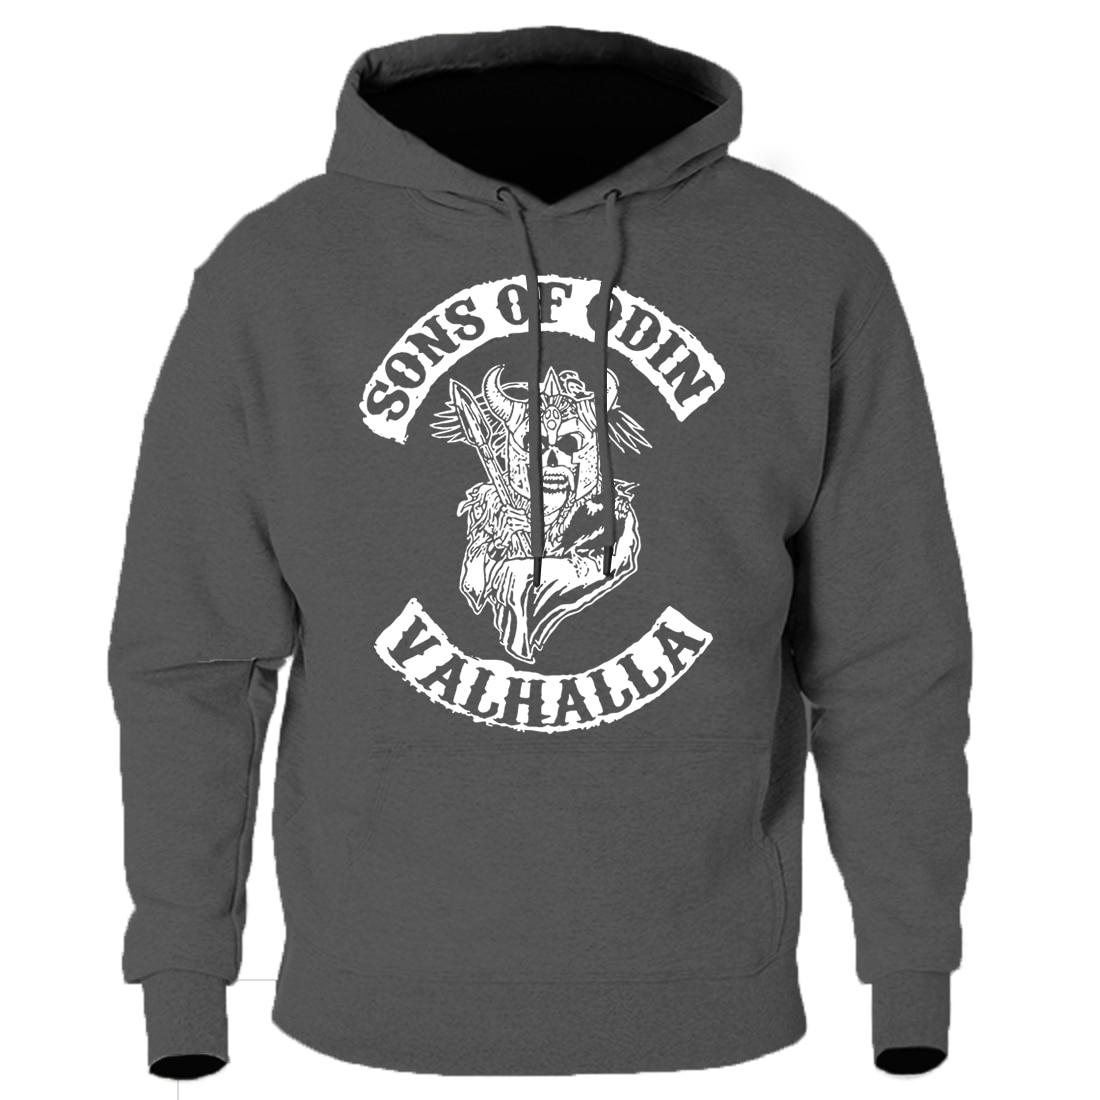 Mens Hooded Hoodies Vikings Sons Of Odin Sweatshirts 2020 Keep Warm Fall Winter Tracksuits Fashion Casual Long Sleeve Hoody Man